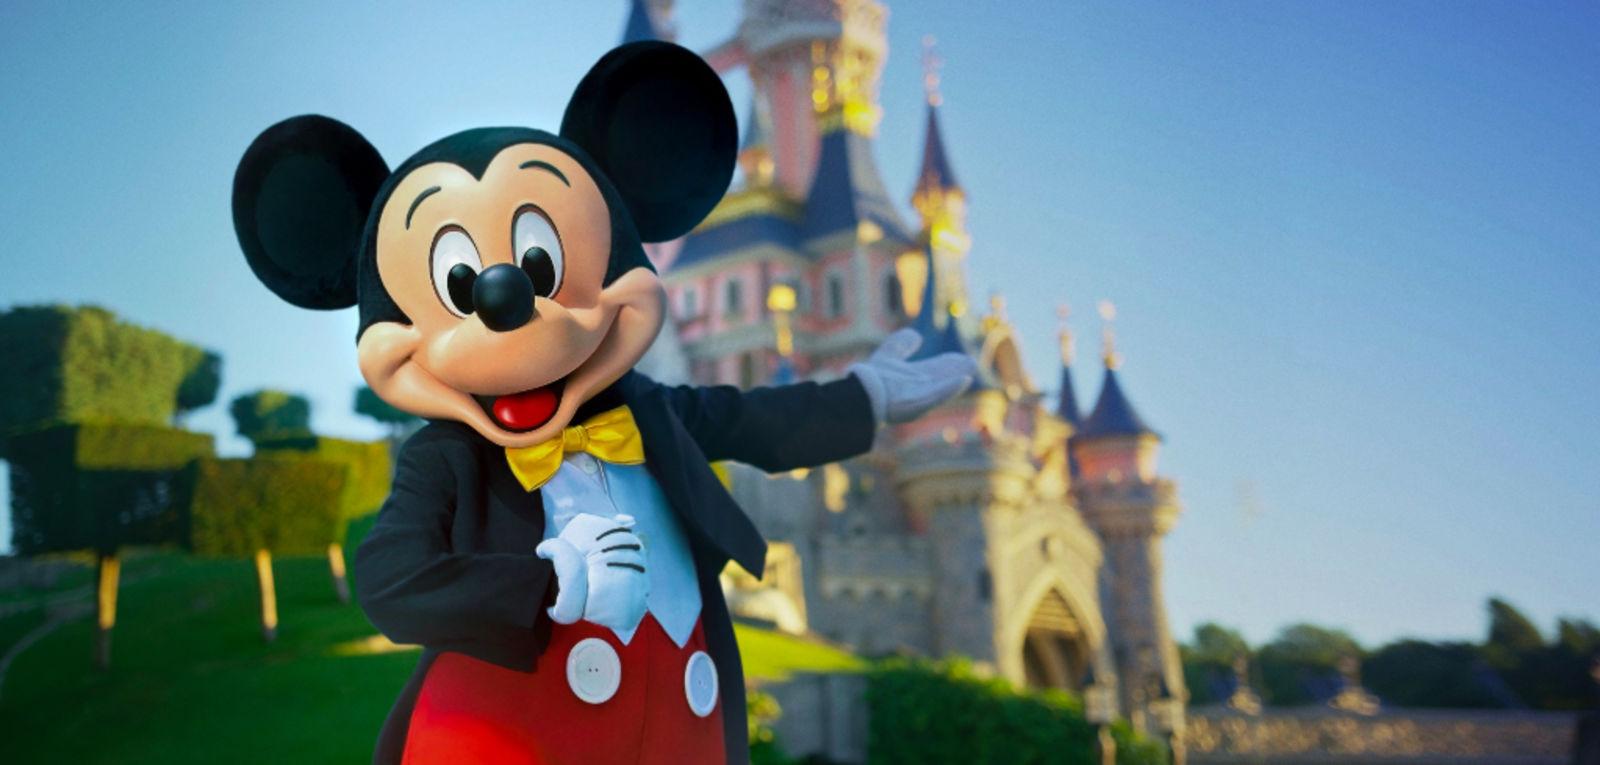 Disneyland Paris, Disneyland Resort Paris, France